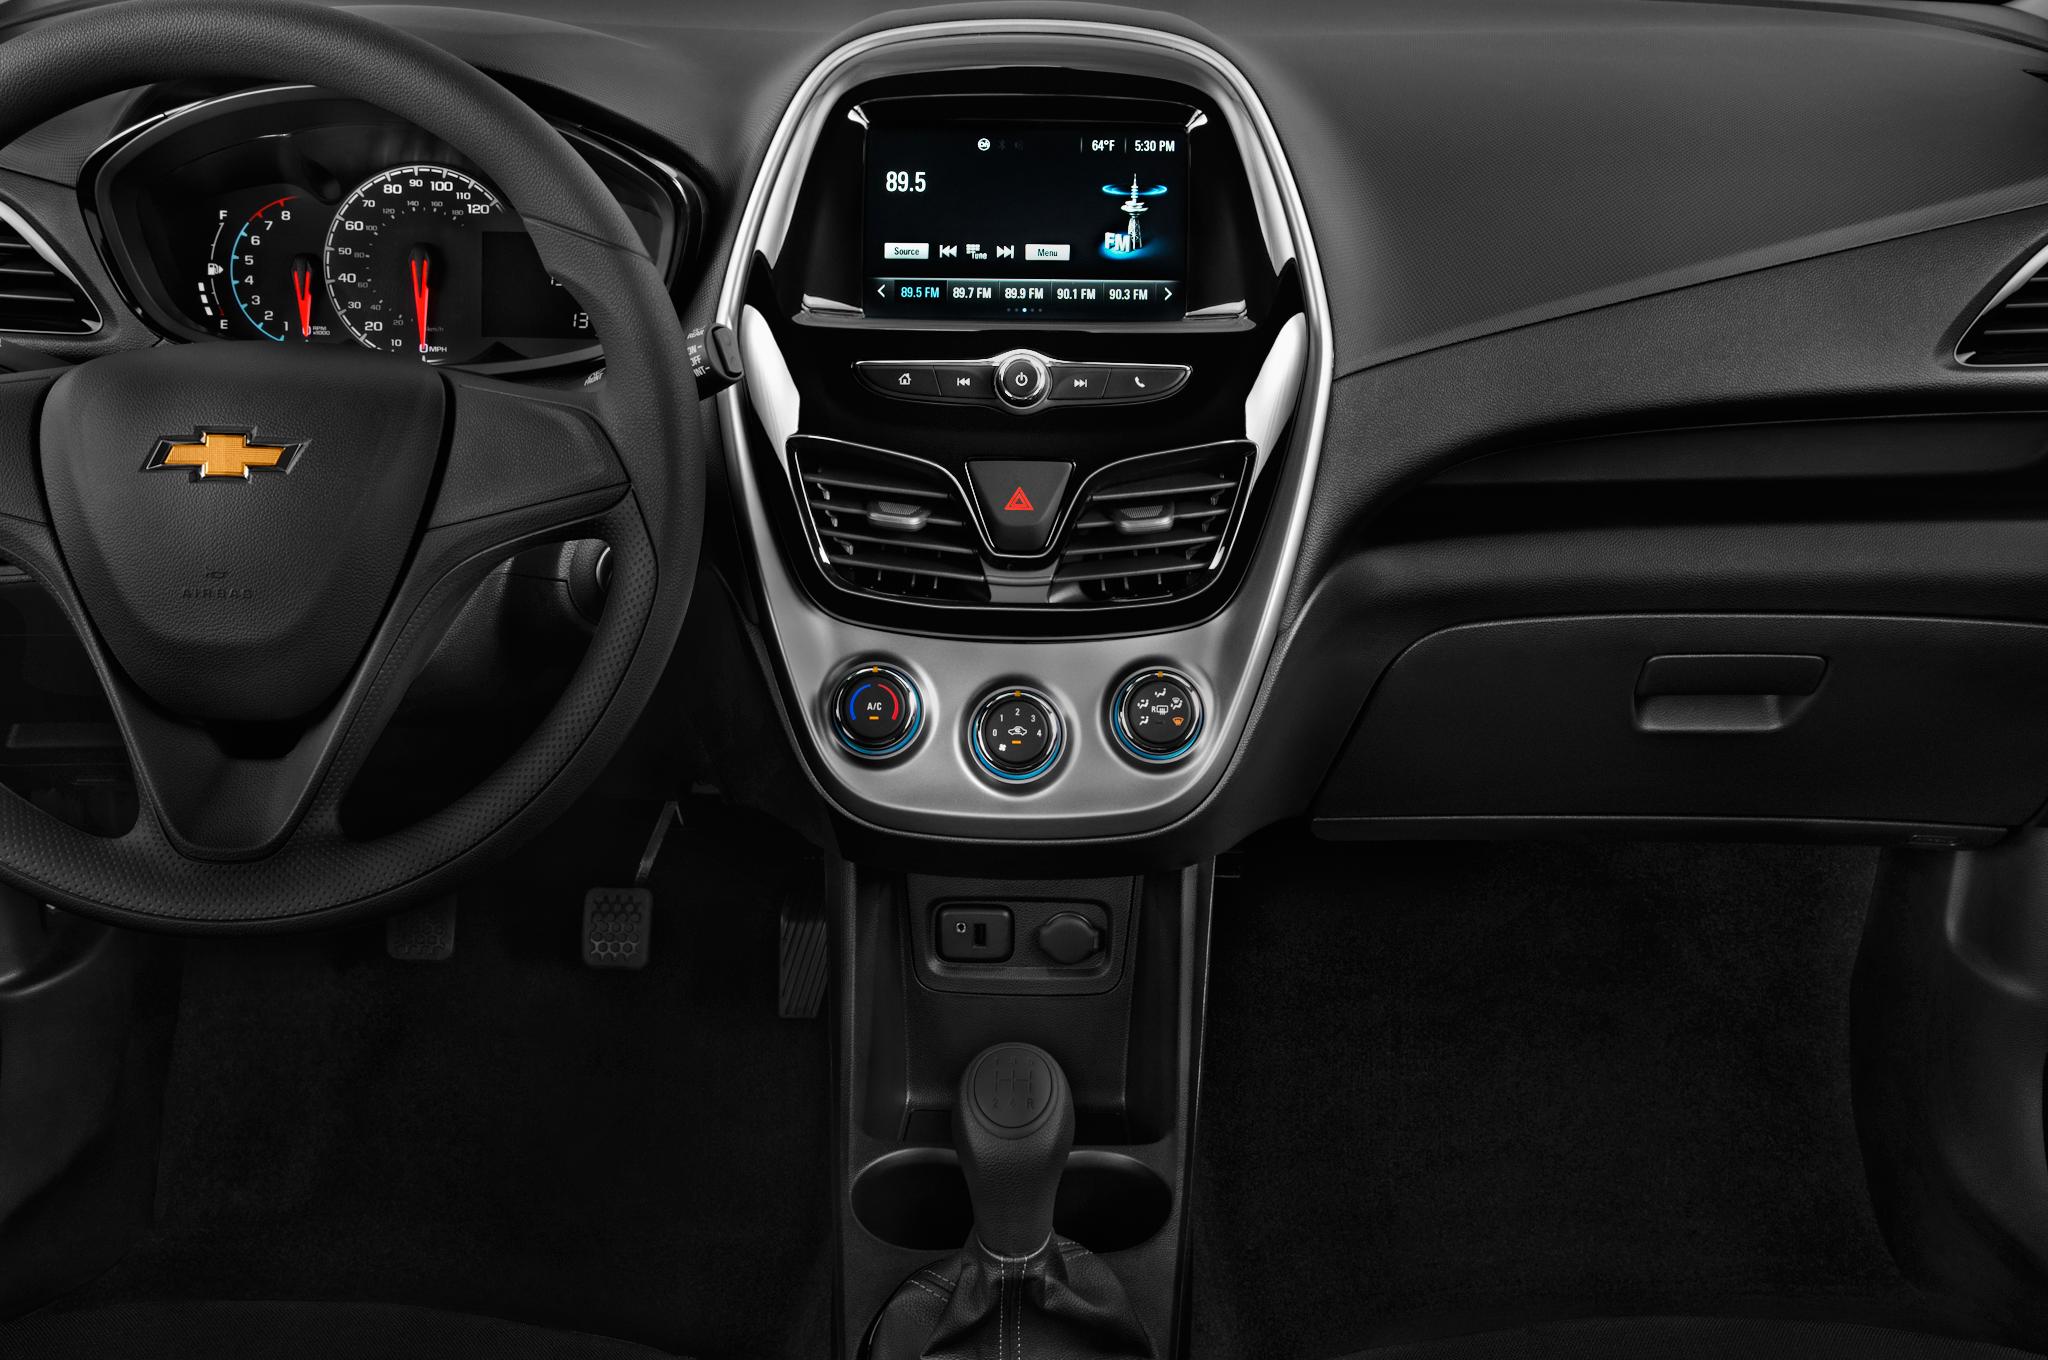 2017 Chevrolet Spark Activ Does Its Best Crossover Impression